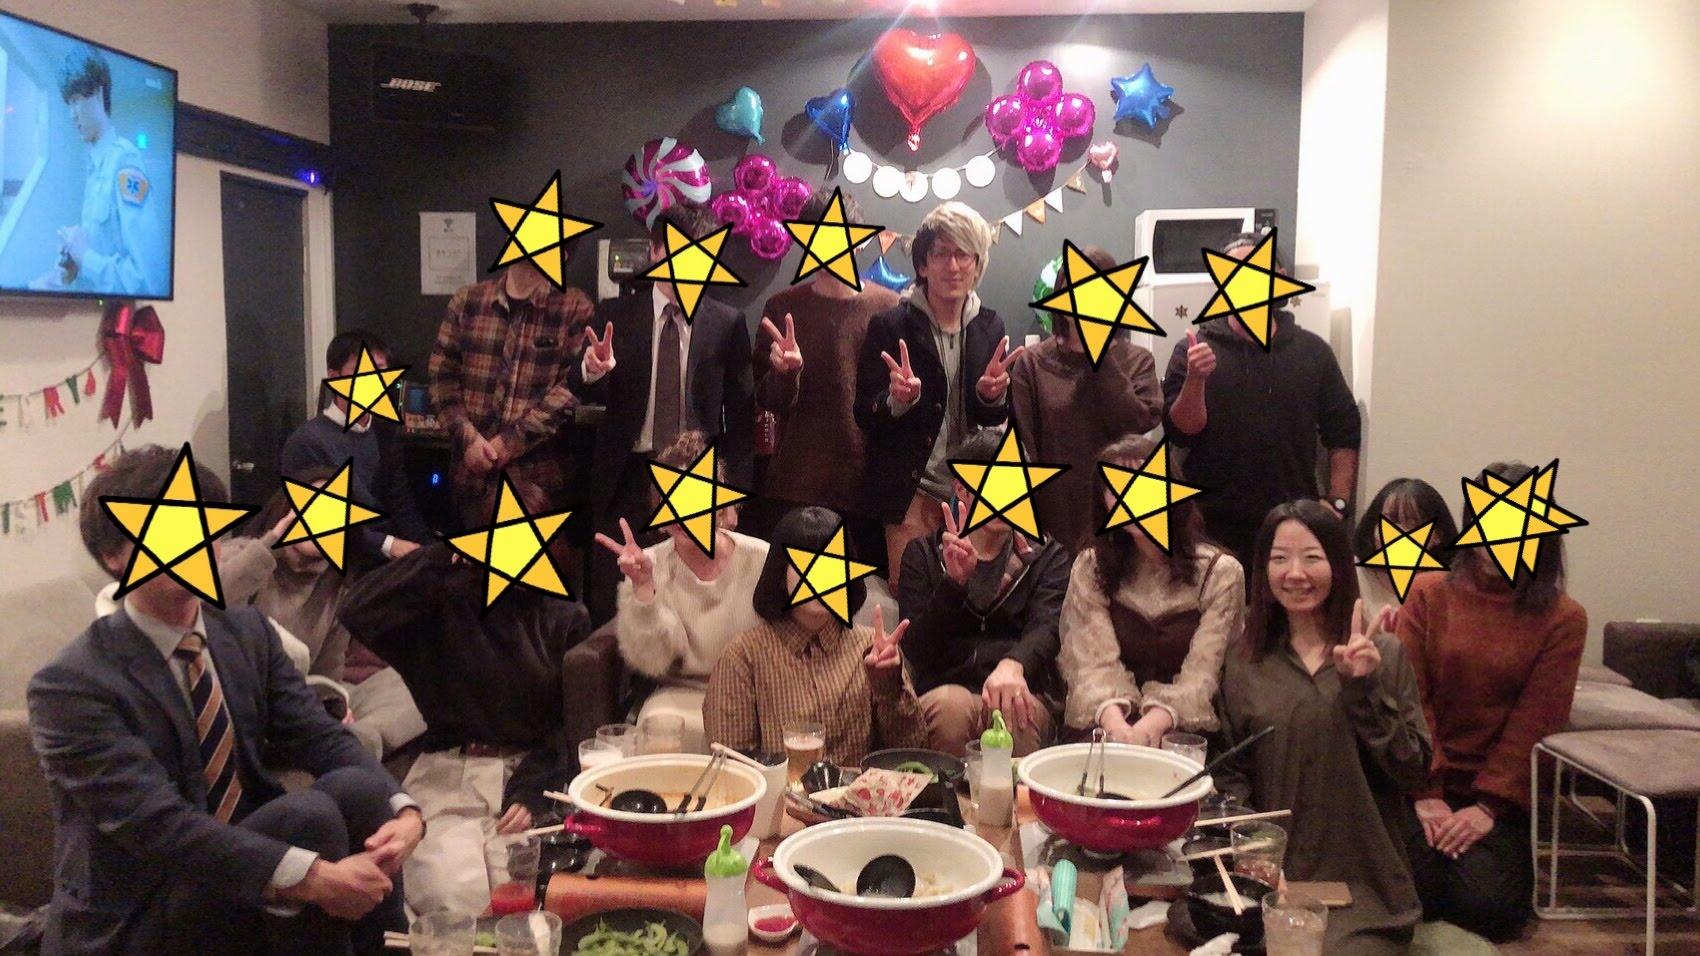 30代飲み会岡山11月22日開催の様子